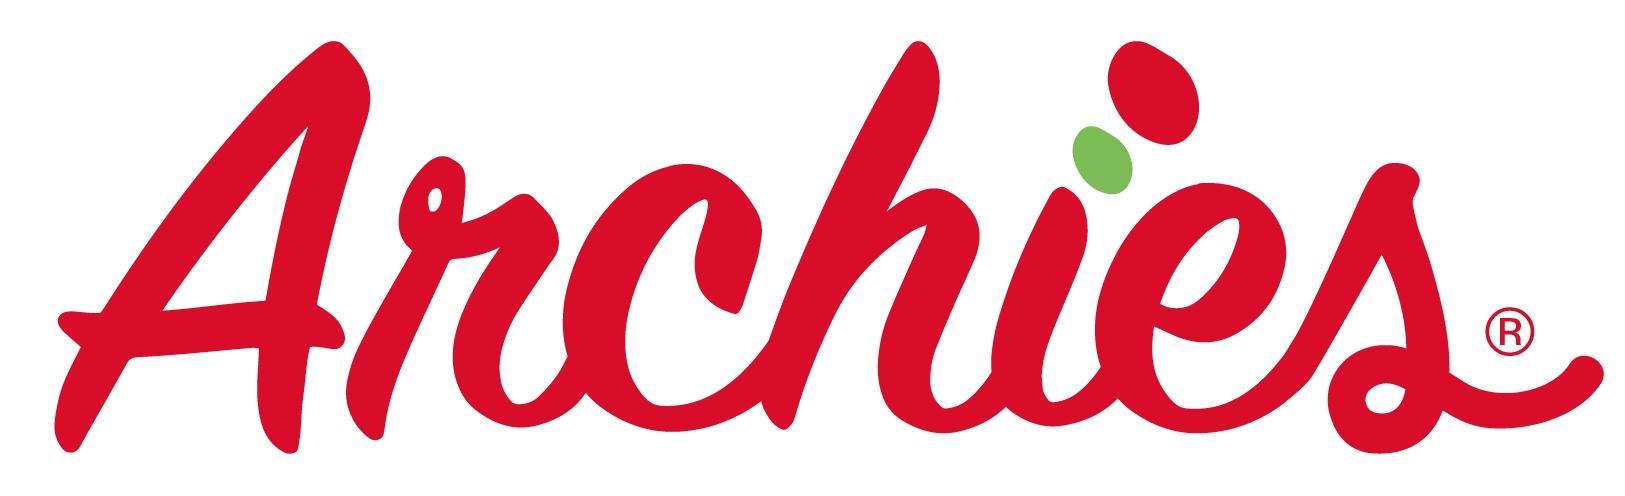 Archies Chia